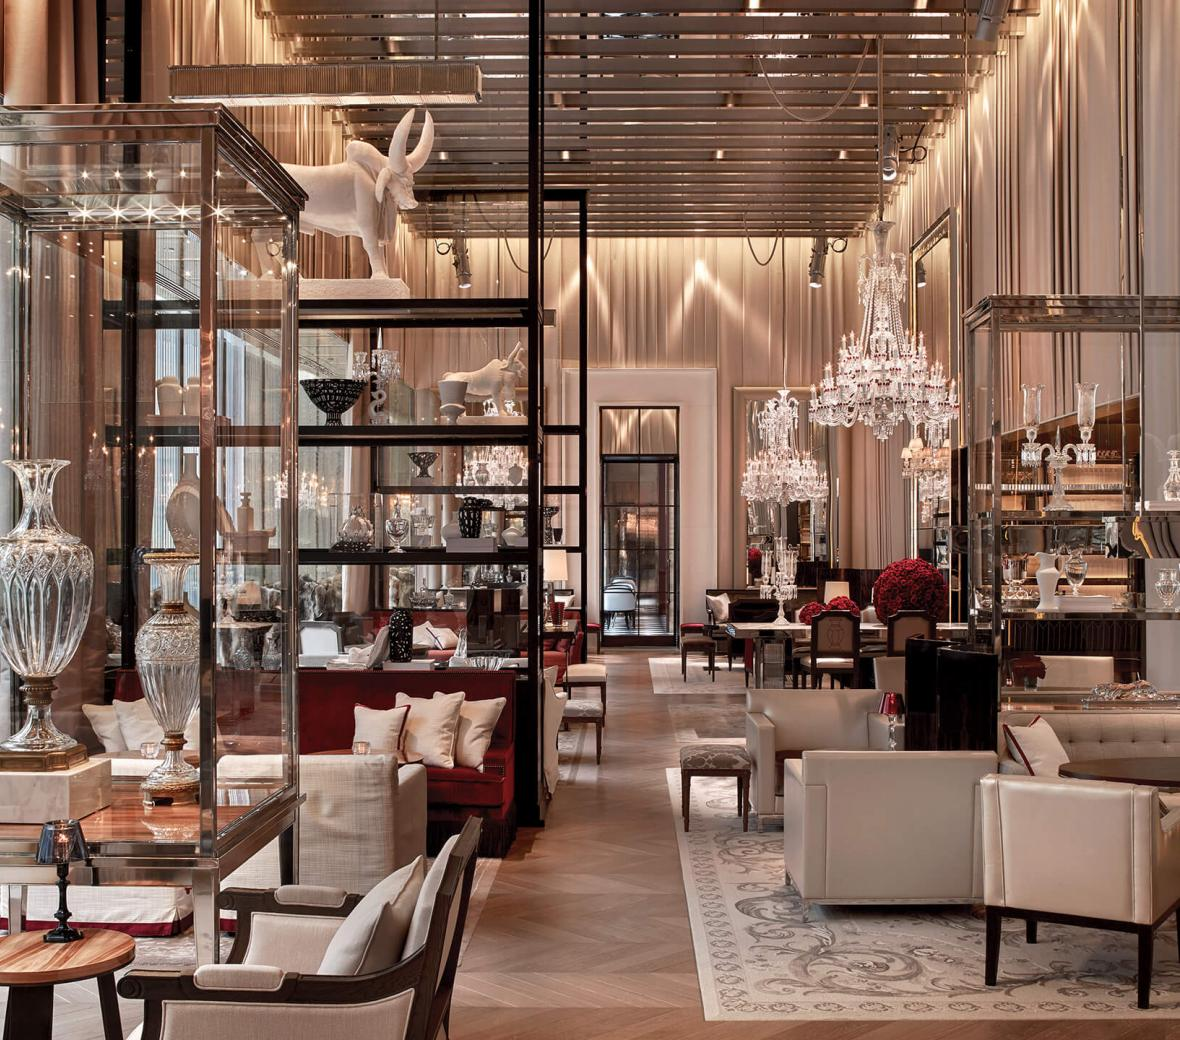 baccarat hotel nyc march 2015 grand salon 2 - Baccarat Hotel